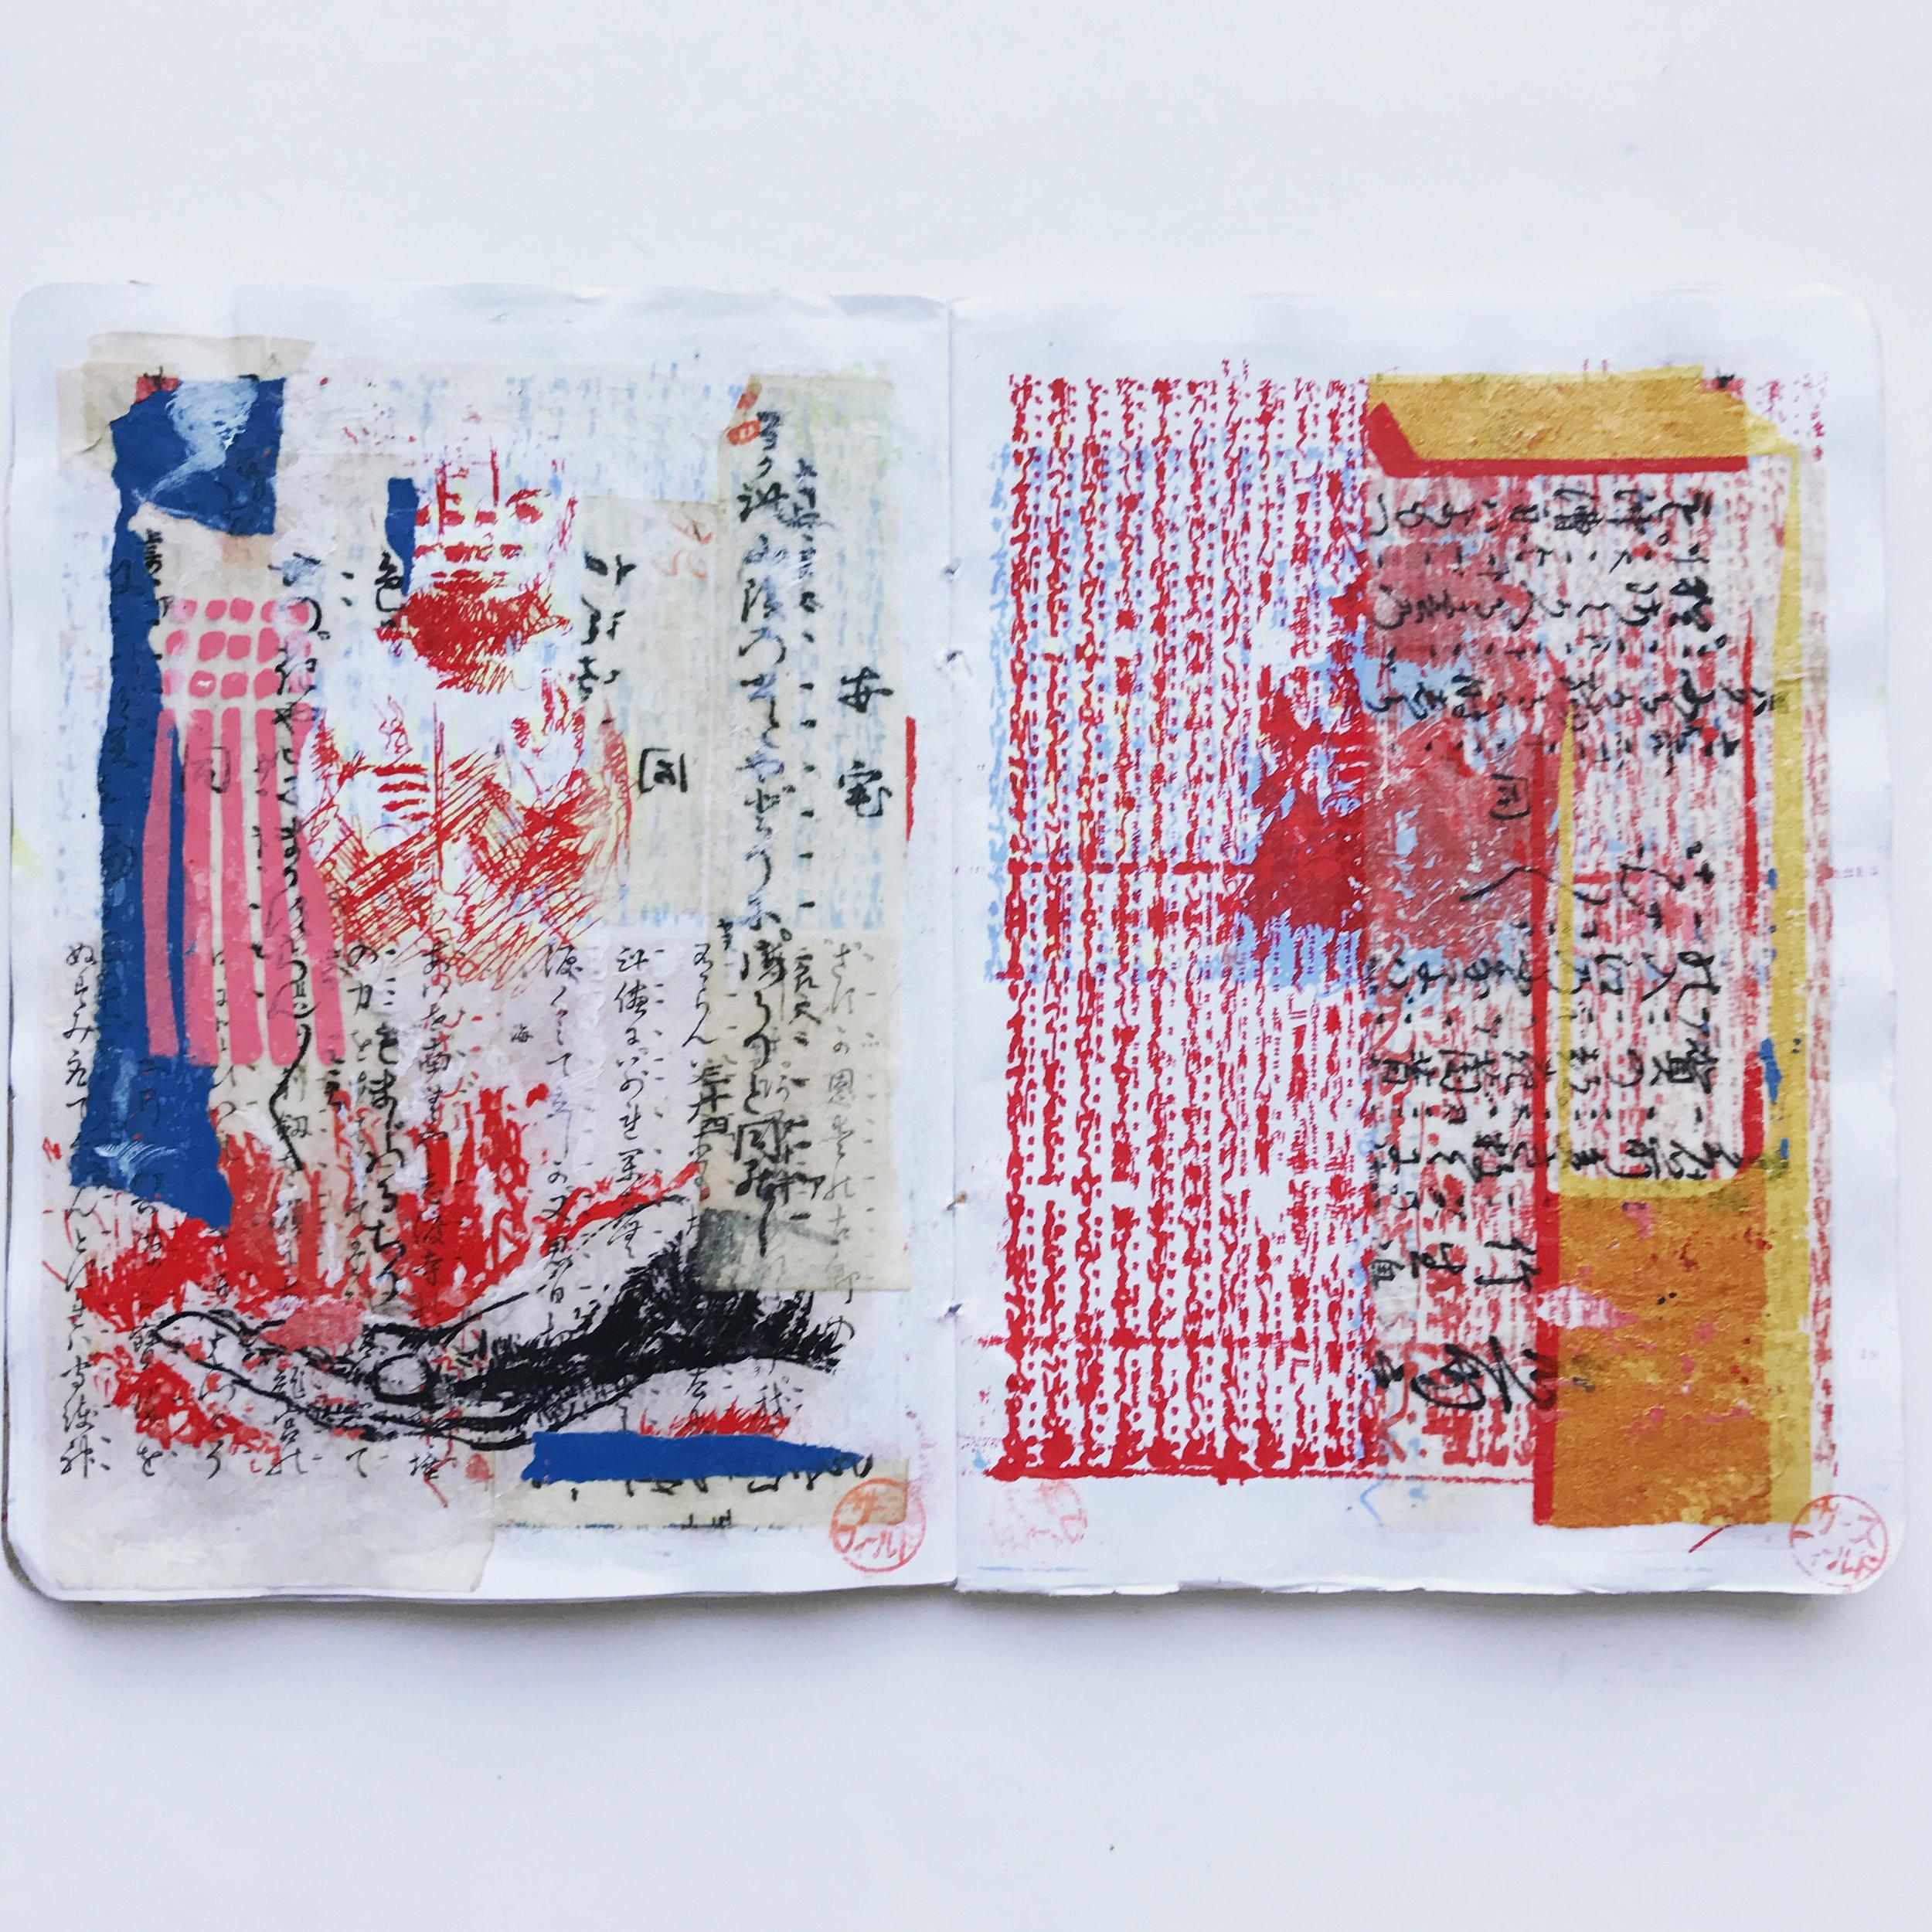 Brendan Sarseield: Tokyo, Japan